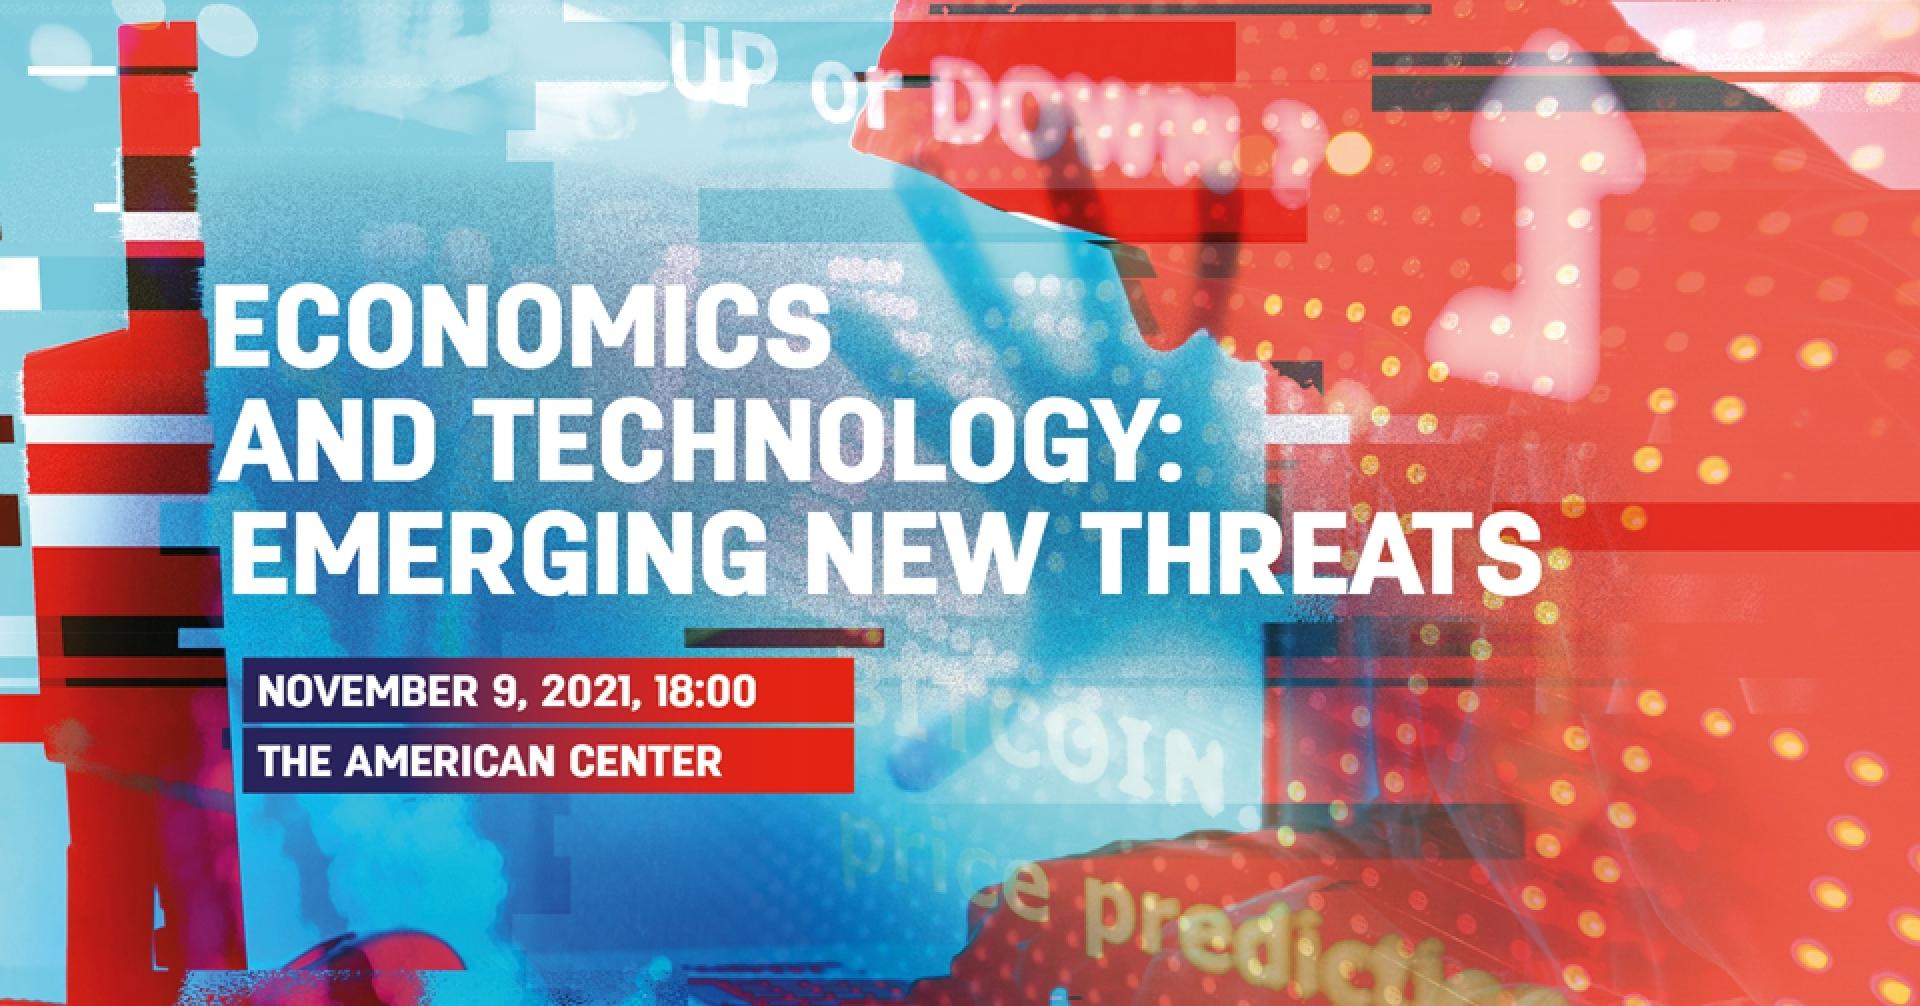 9348_pssi-economics-and-technology-emerging-new-threats-v-960x503